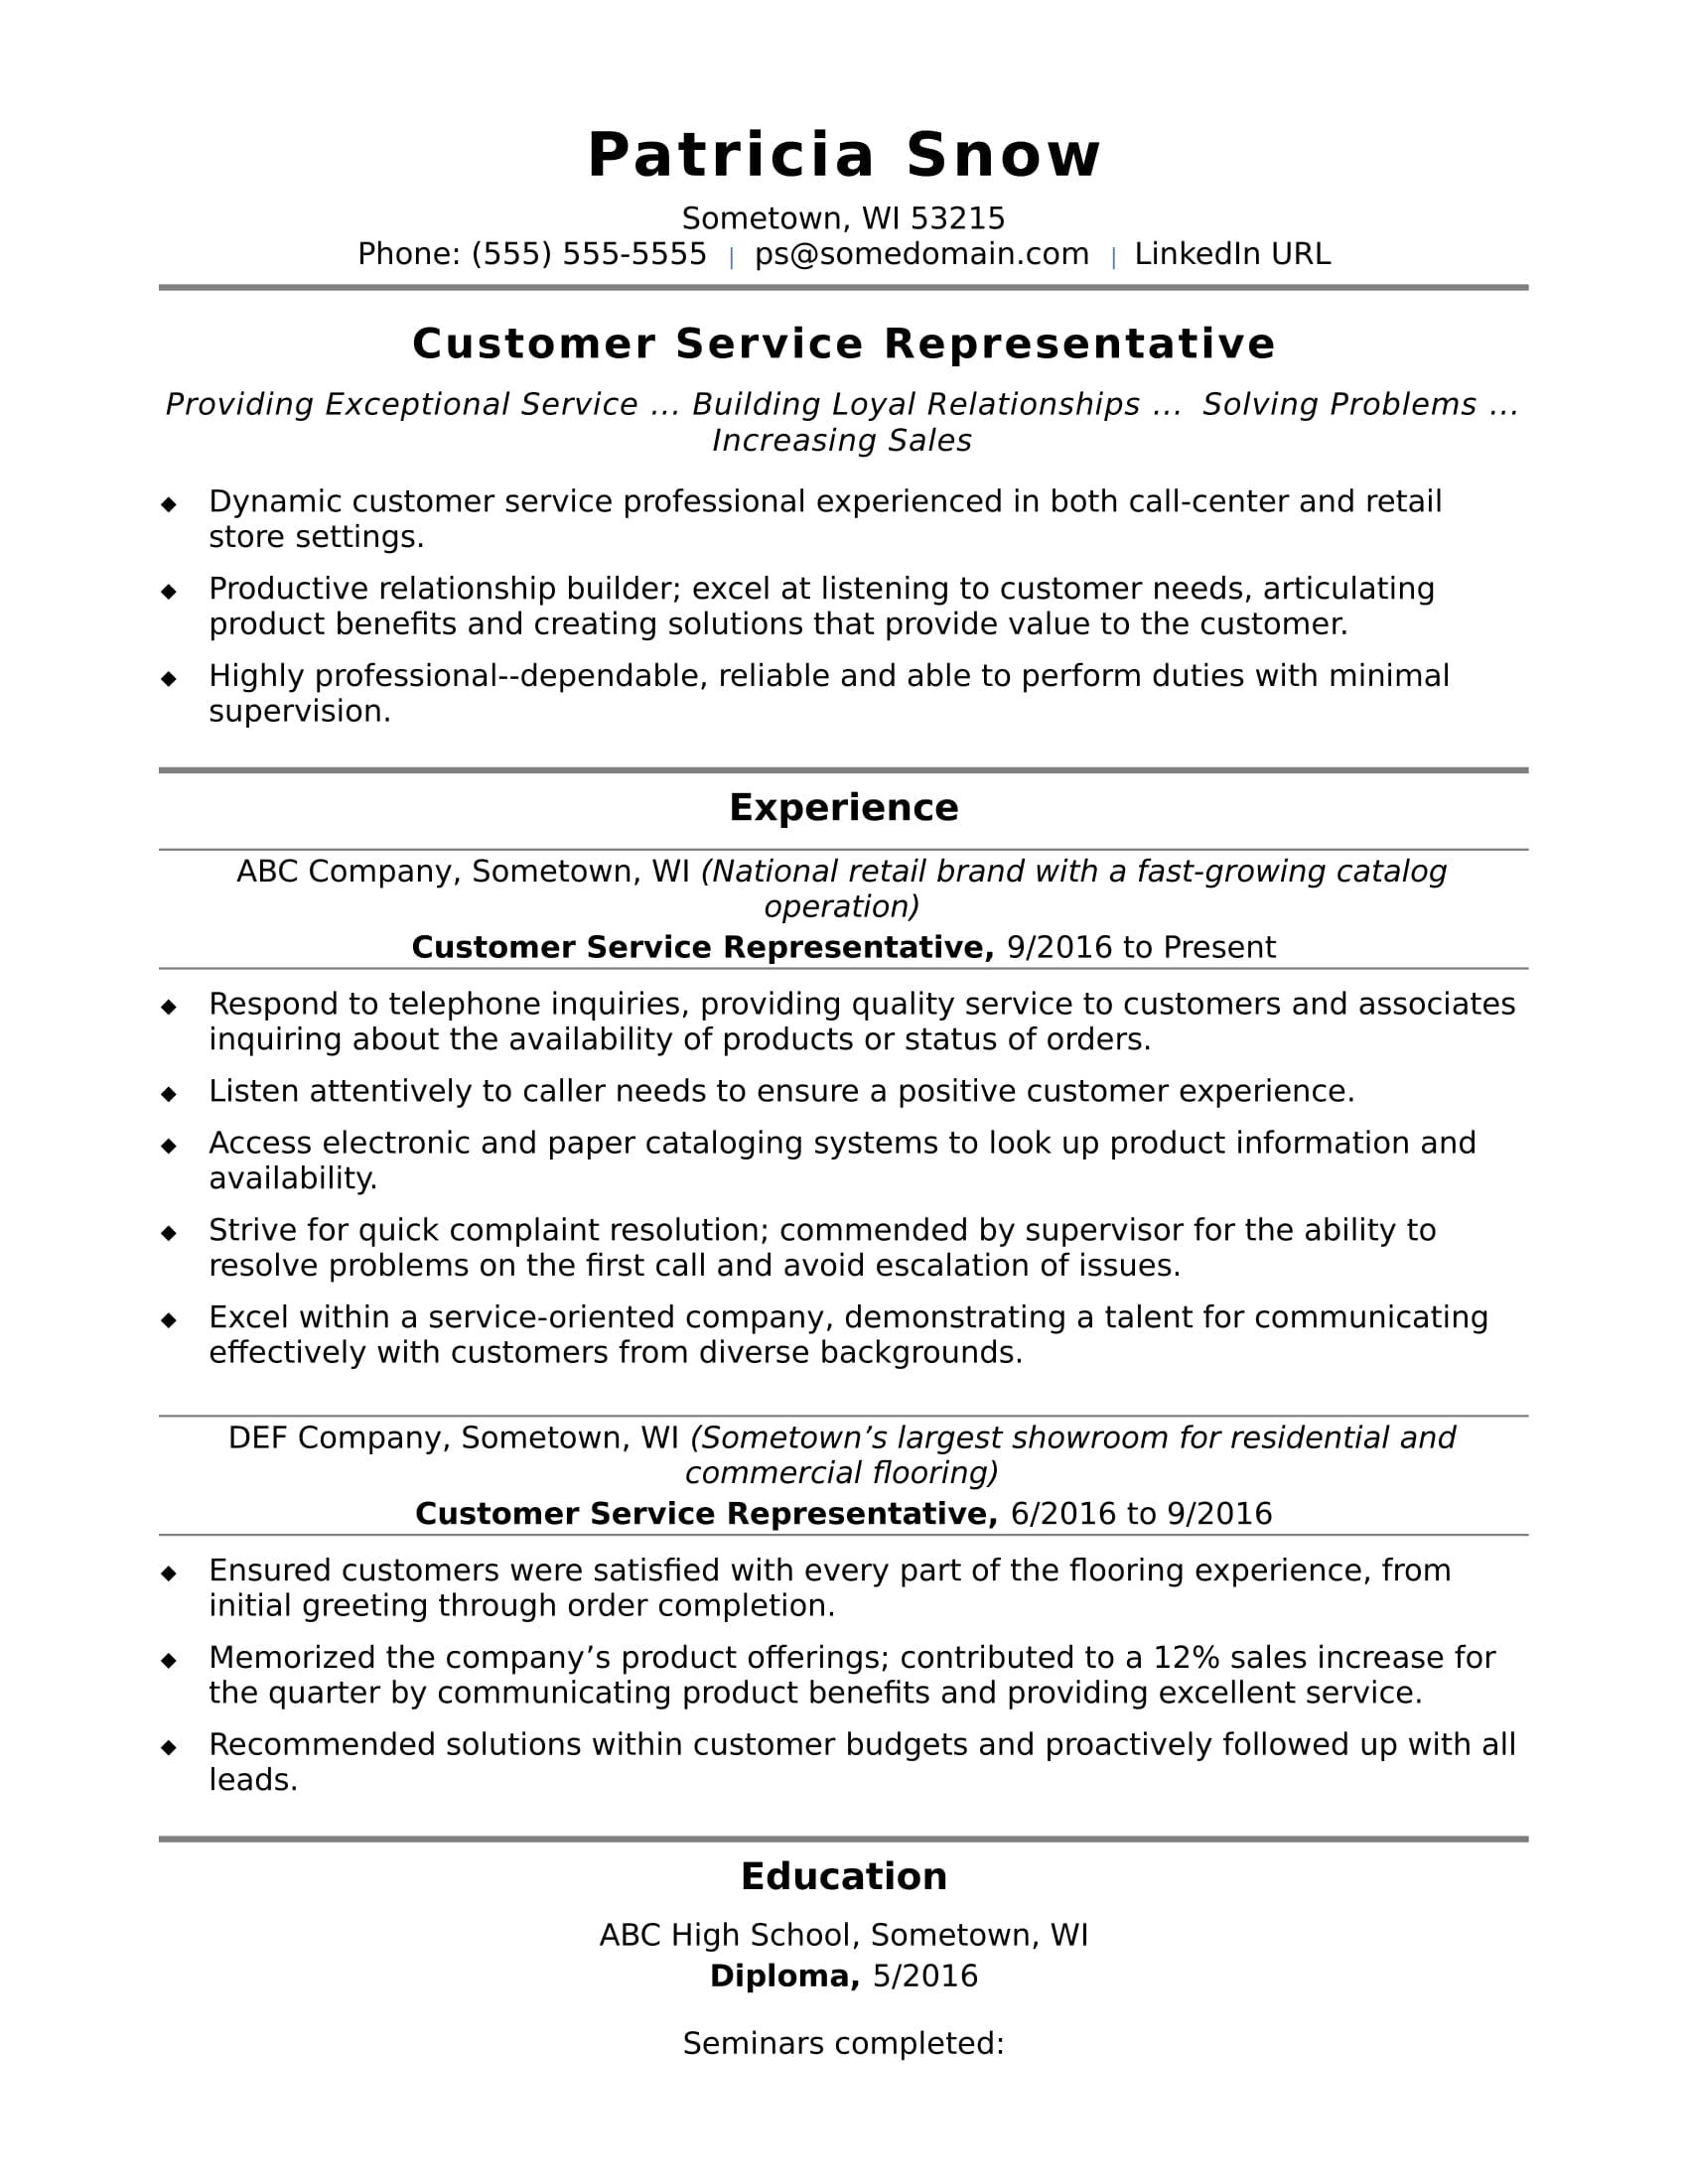 Sample advanced level customer service resume